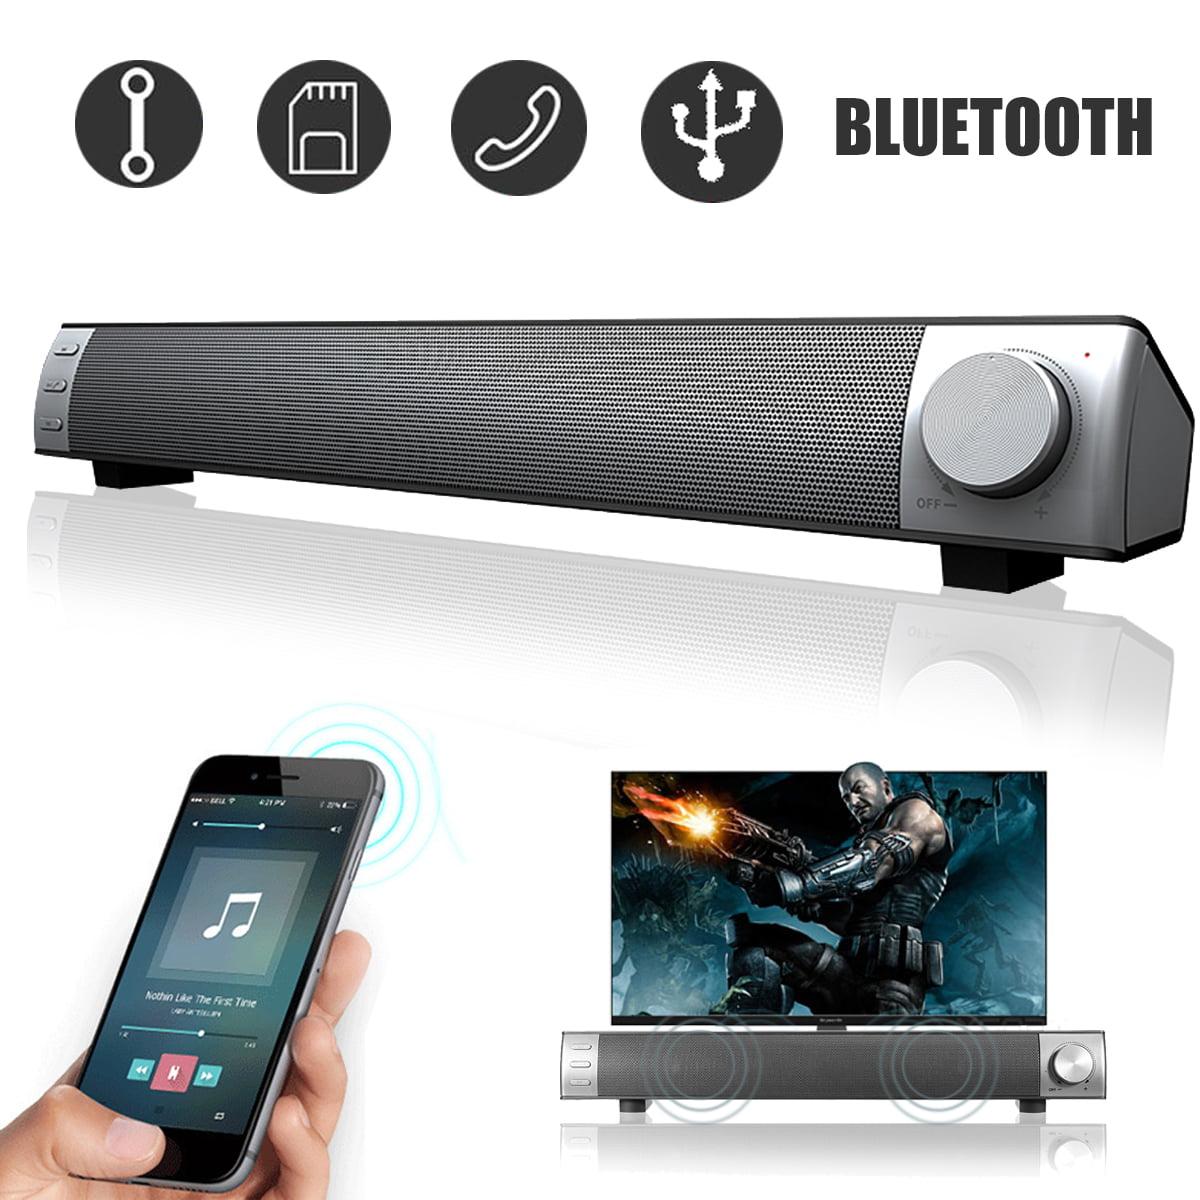 Home TV Theater 3D Surround Stereo Super Bass Sound Bar Wireless bluetooth 4.2 Speakers Music Player System Soundbar Amplifier Subwoofer